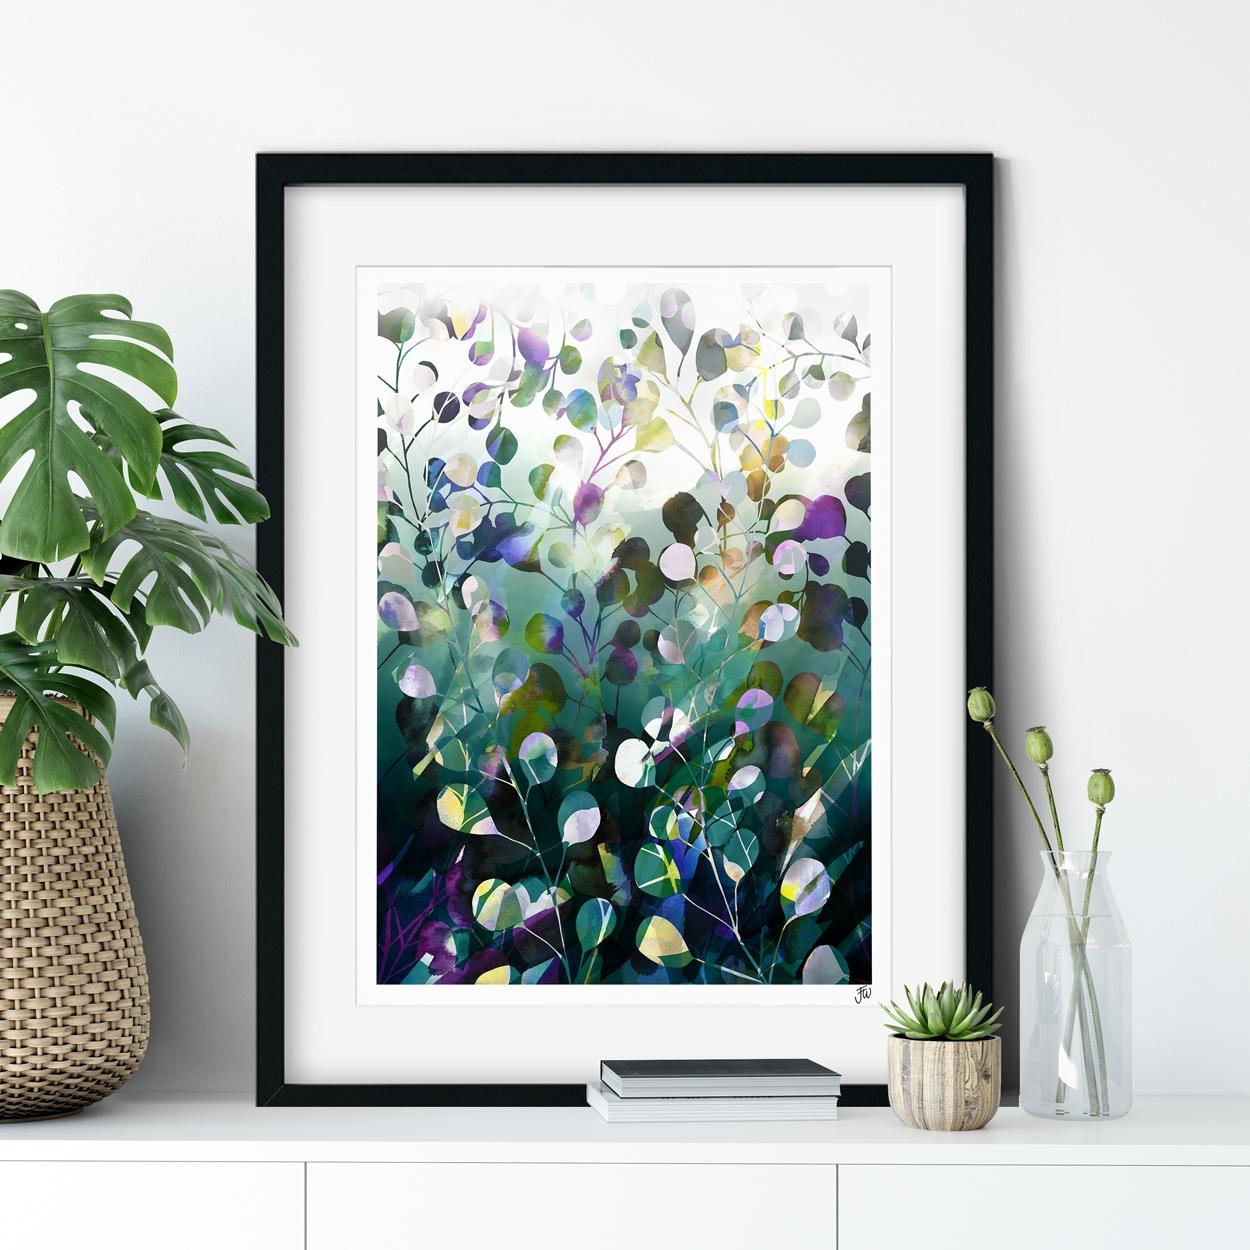 Midnight Botanica Art Print